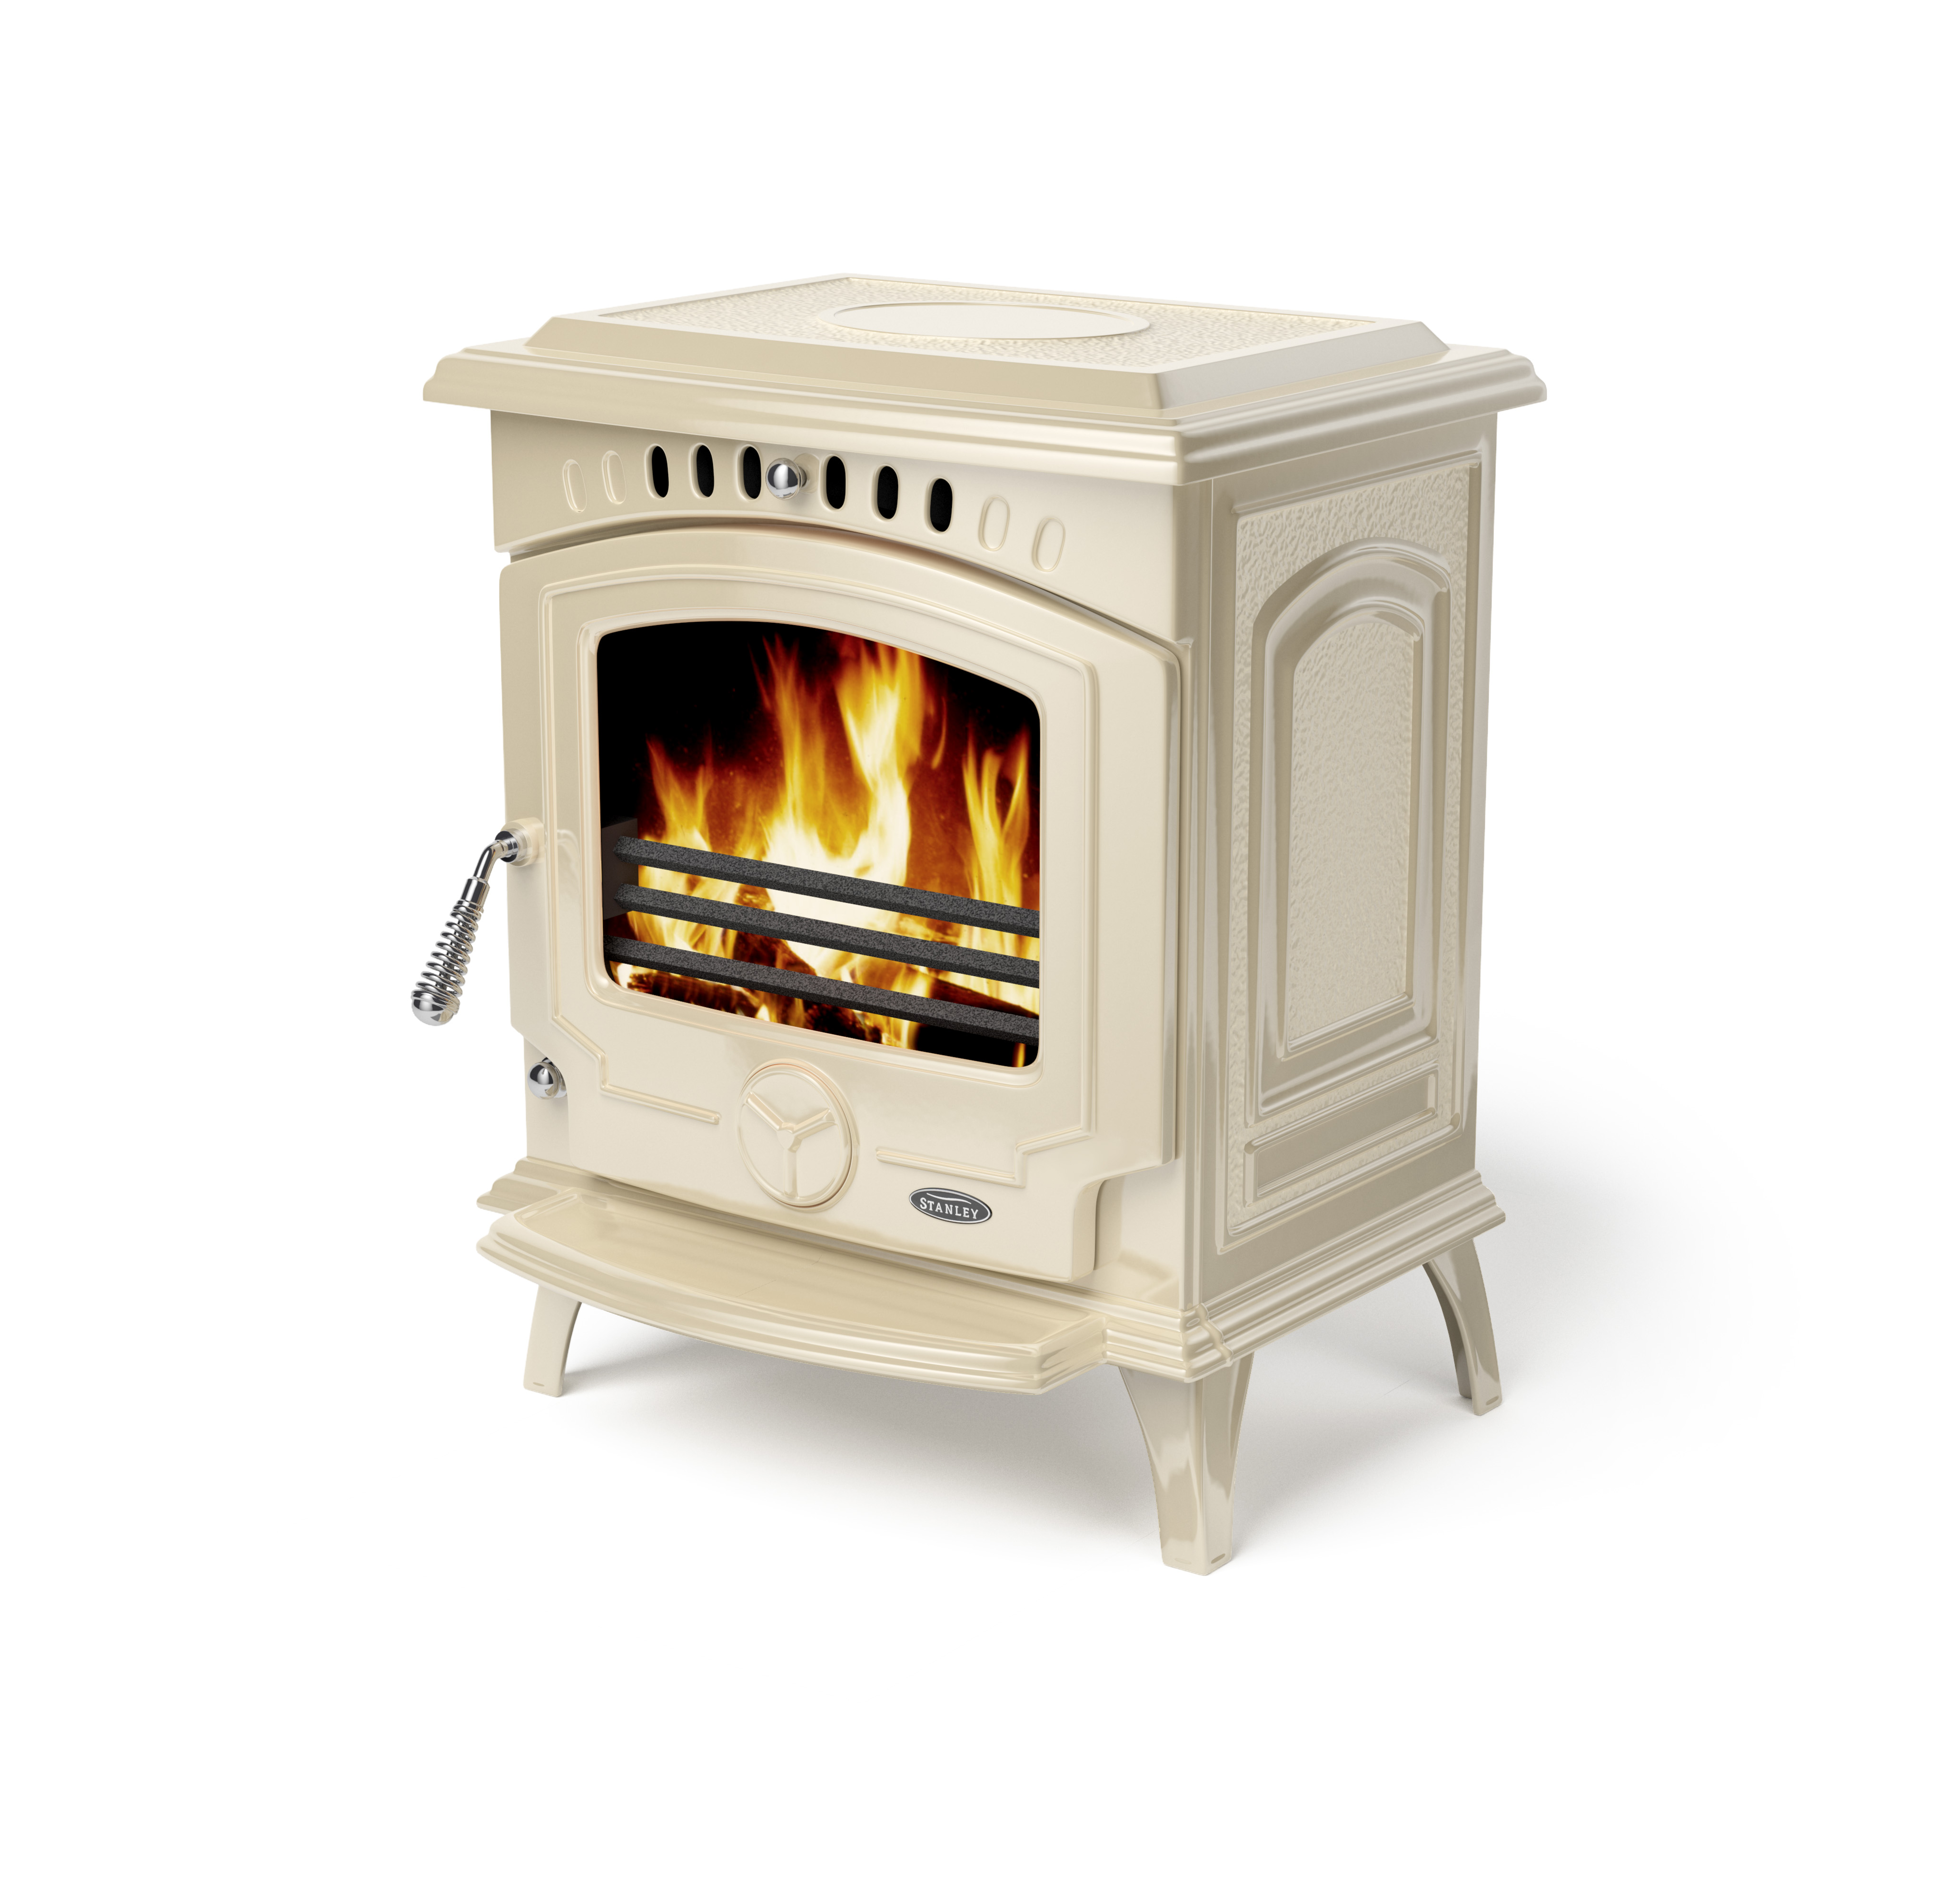 stanley tara multi fuel stove dalzells n ireland. Black Bedroom Furniture Sets. Home Design Ideas